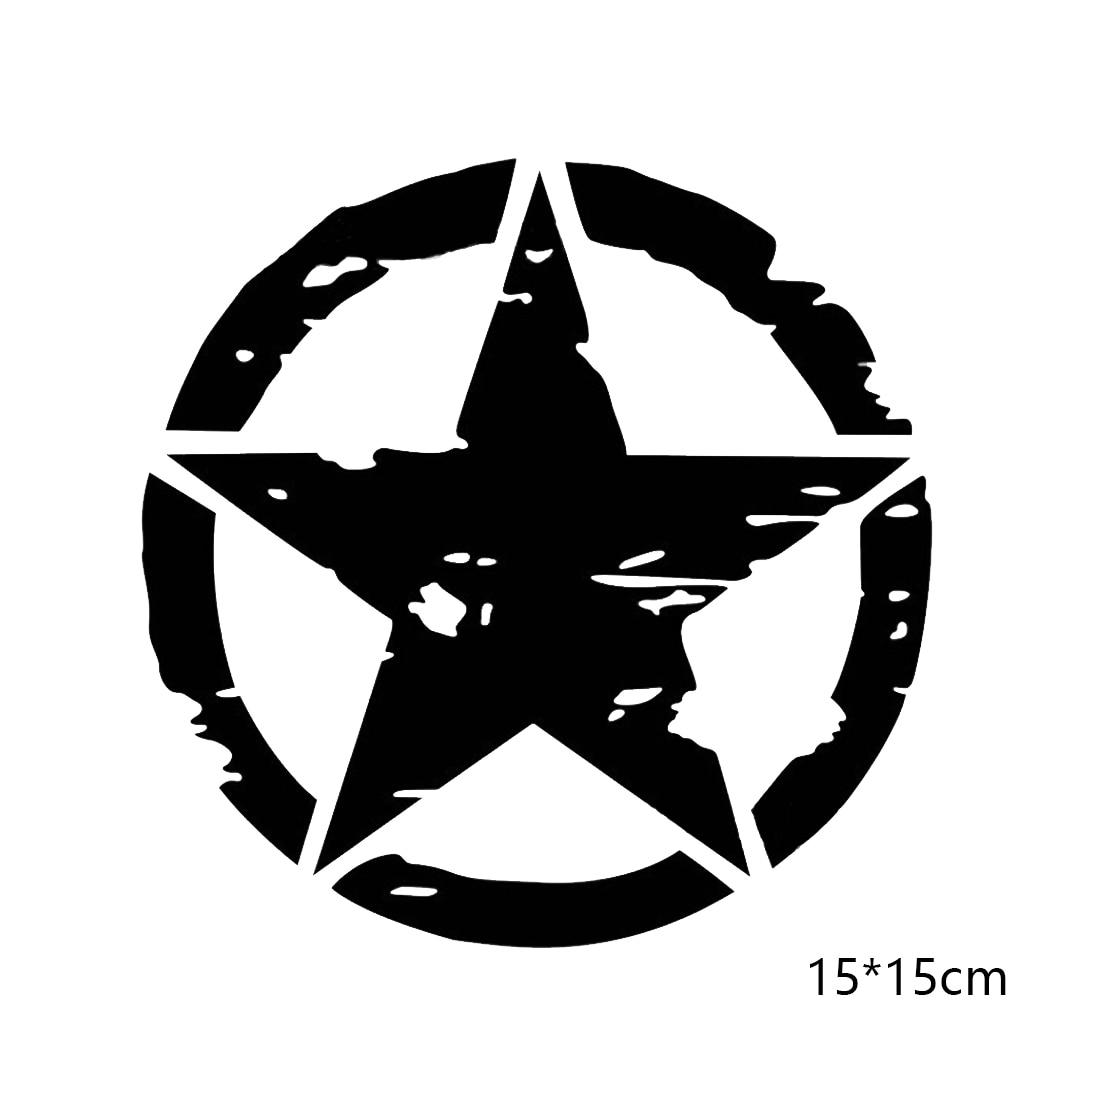 Decal Sticker PINK Army Jeep Distressed Star Vinyl